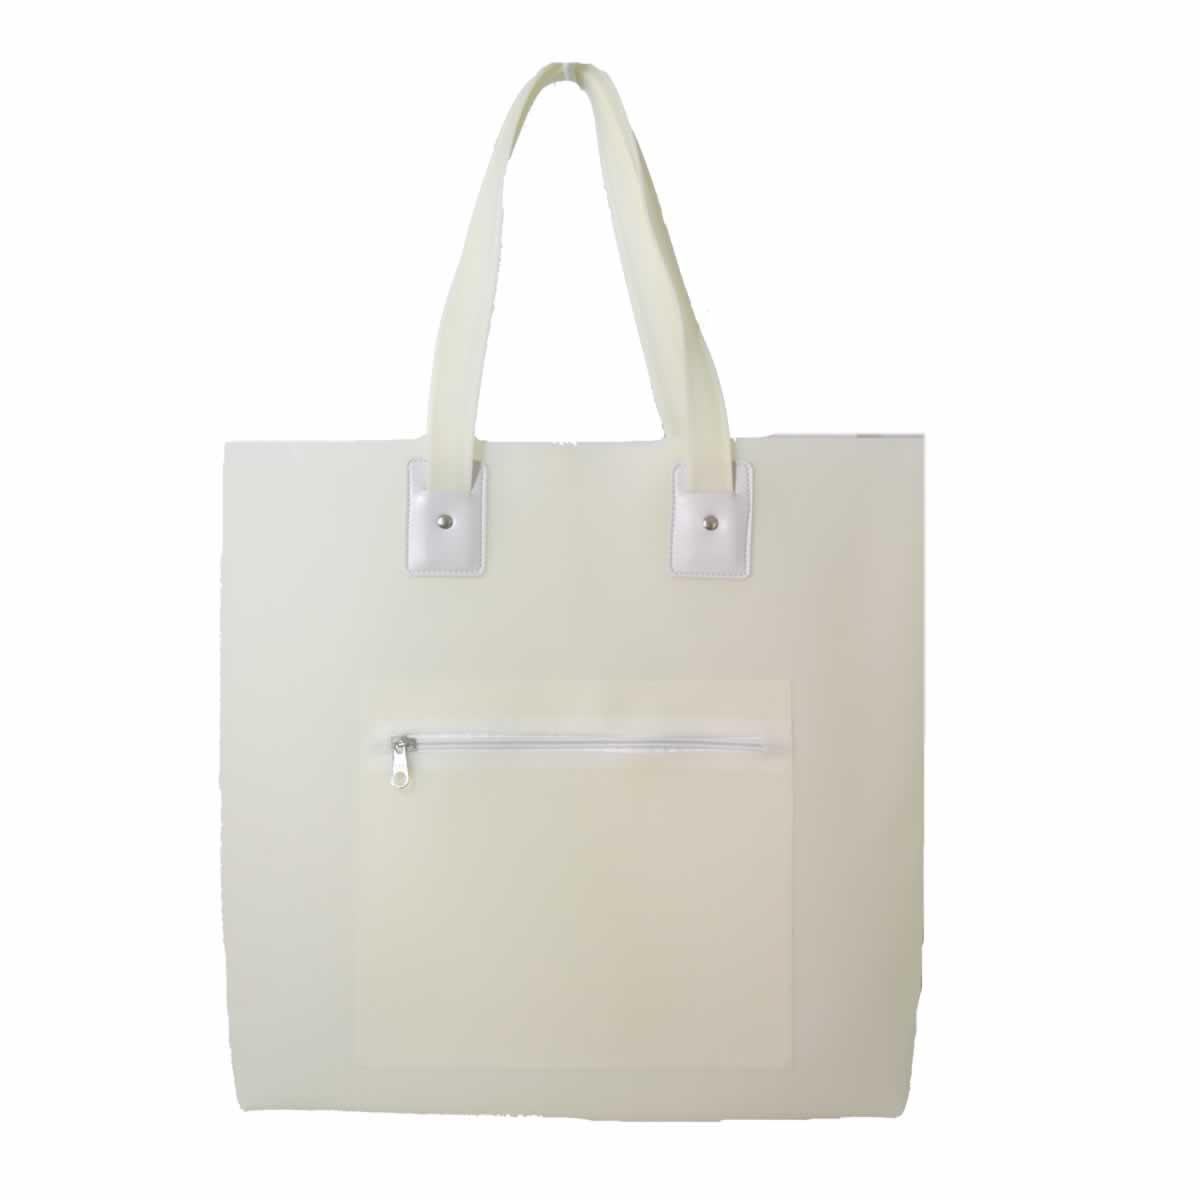 Bolsa de praia branco com bolso zíper